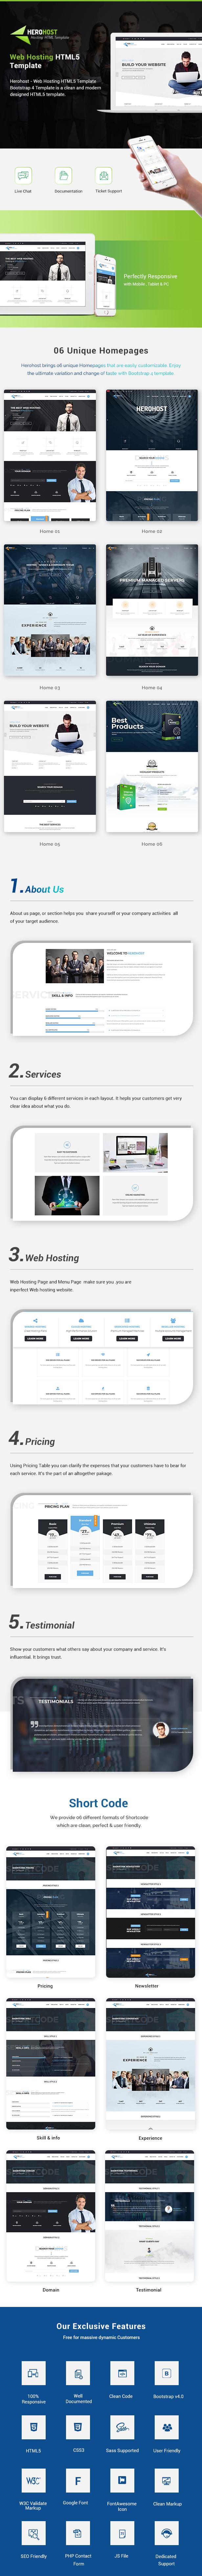 HeroHost - Web Hosting HTML Template - 1